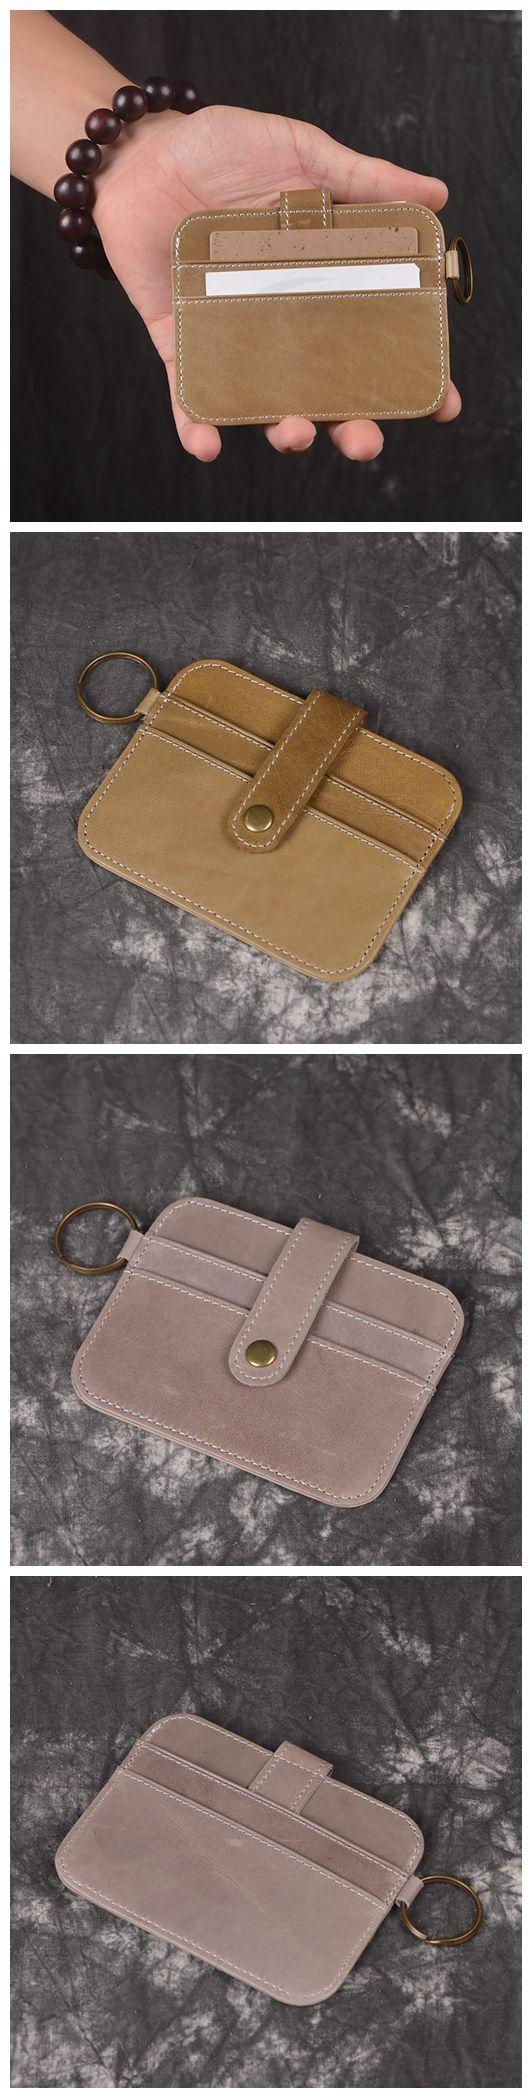 Handmade Genuine Leather Wallet Unisex Card Holder